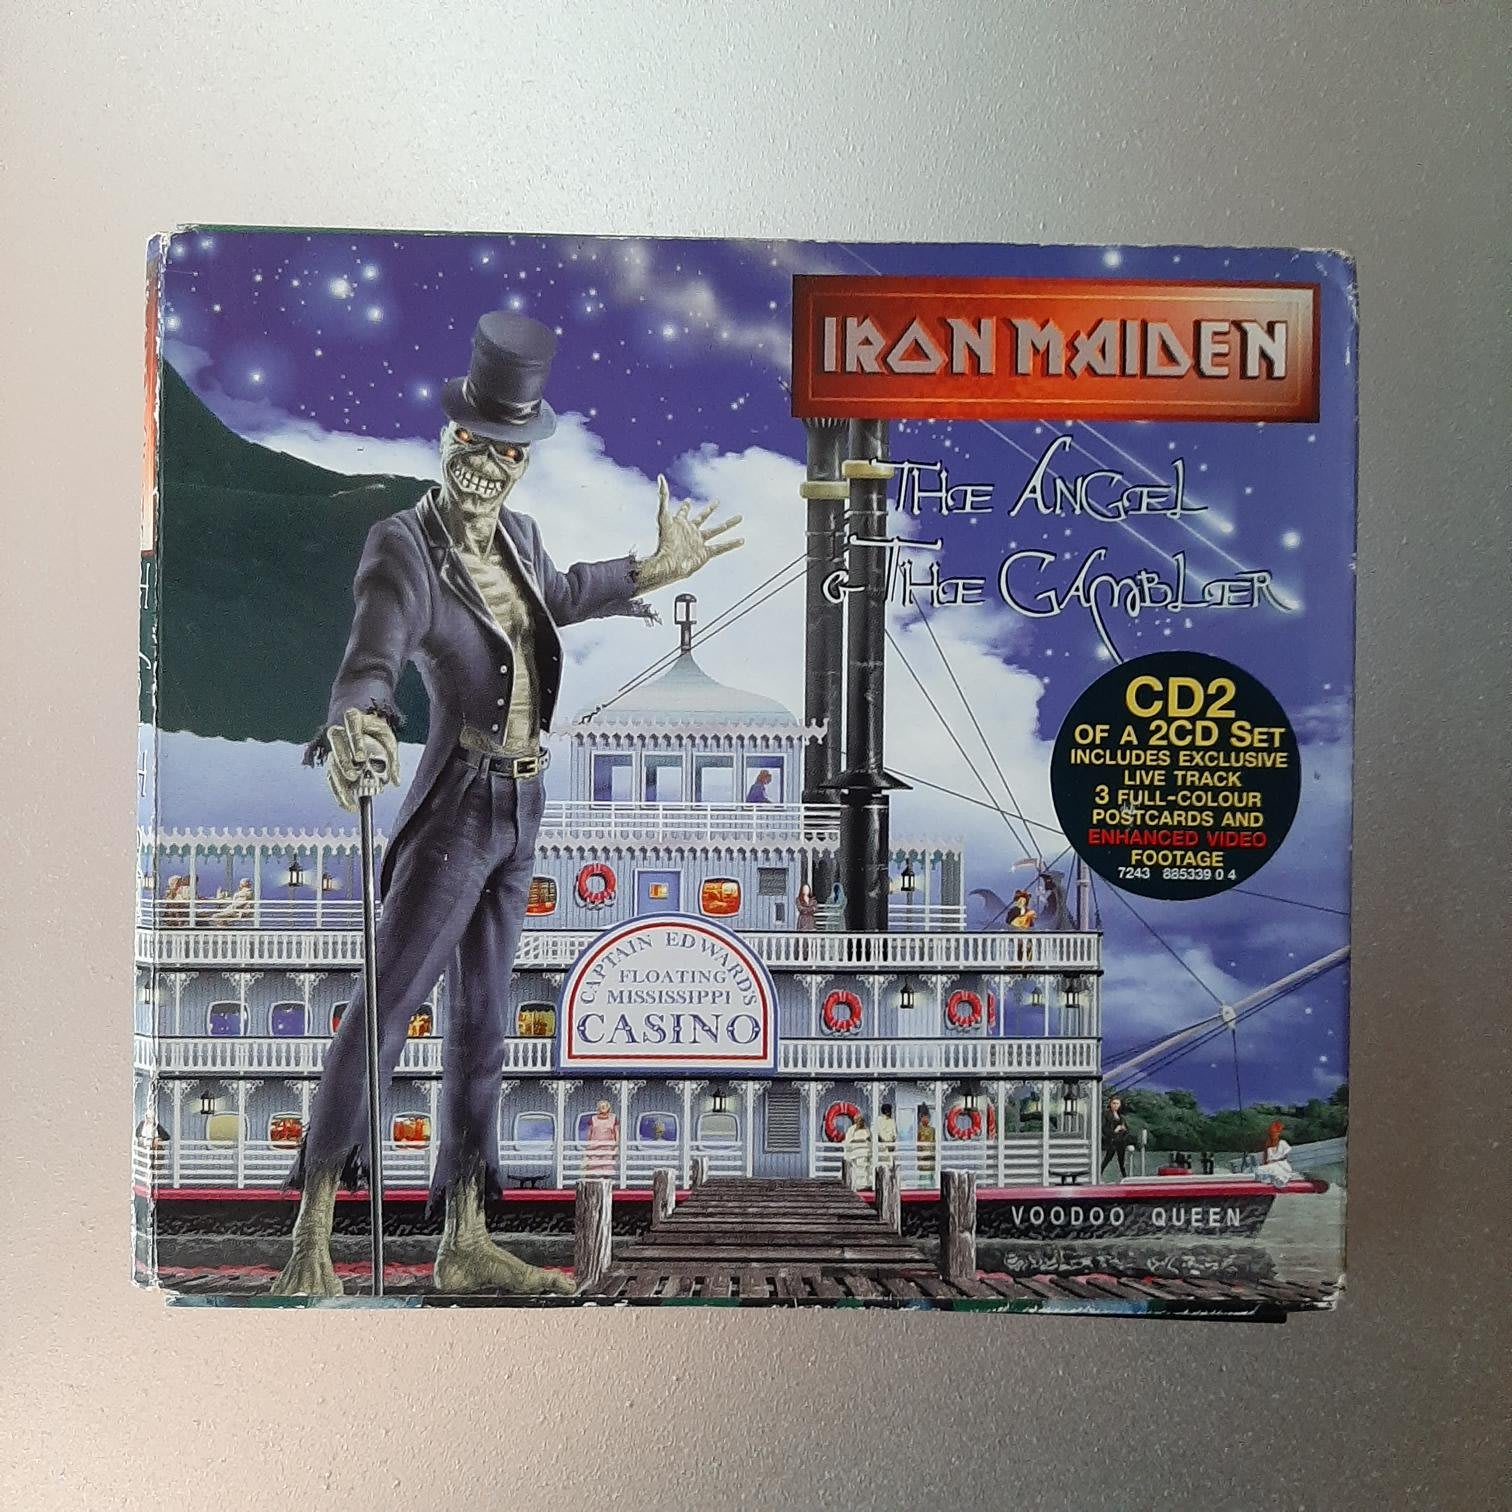 【裊裊影音】鐵娘子Iron Maiden-Angel And The Gambler(Promotinal Copy)宣傳單曲CD紙版裝-EMI 1998發行